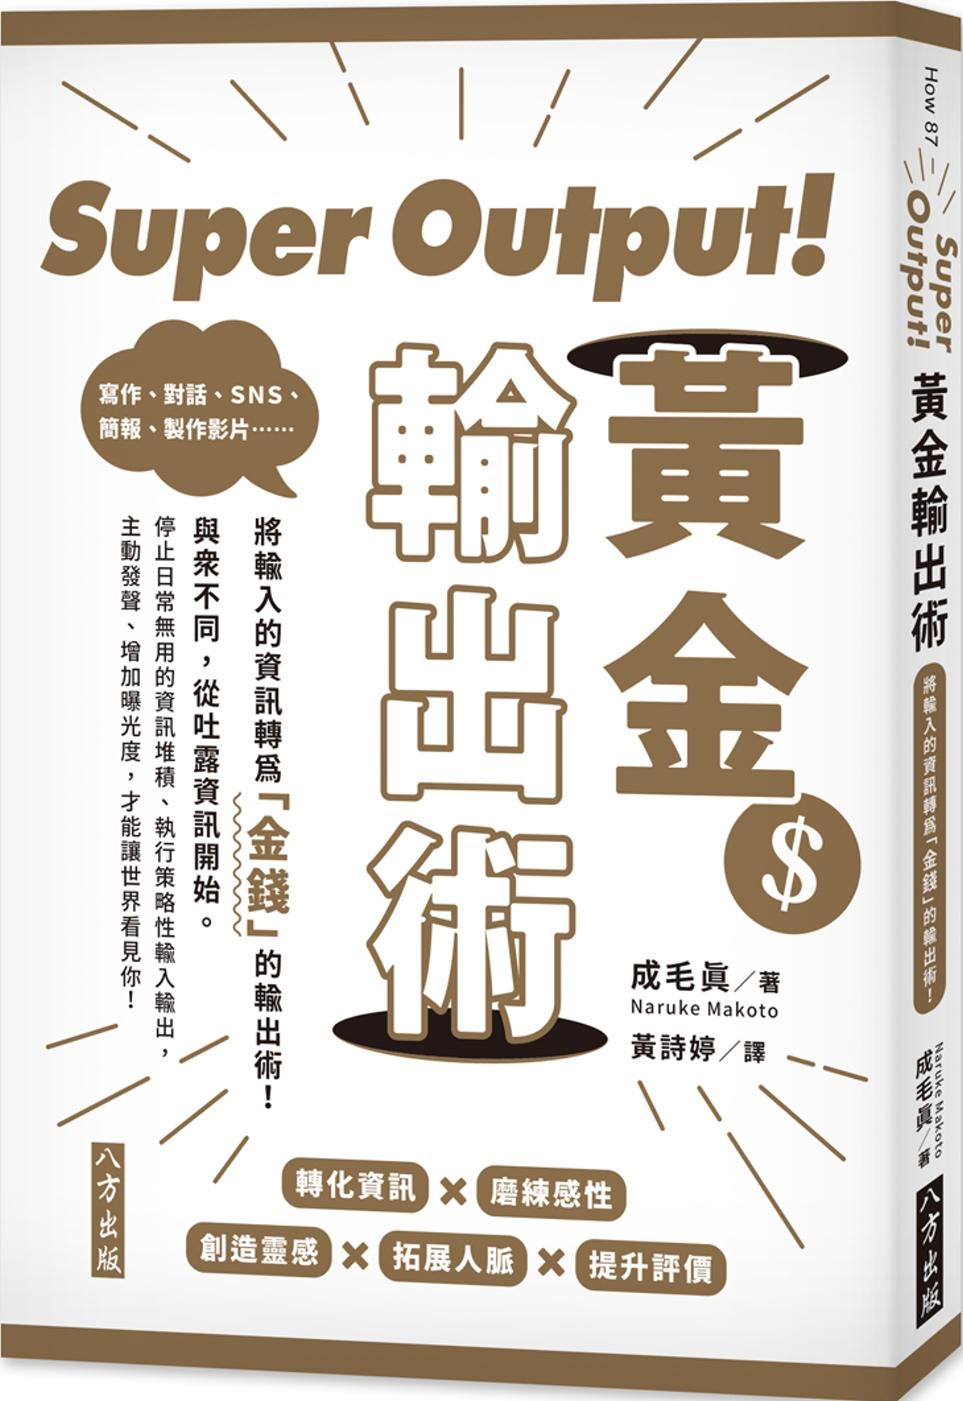 Super Output!黃金輸出術:將輸入的資訊轉為「金錢」的輸出術!